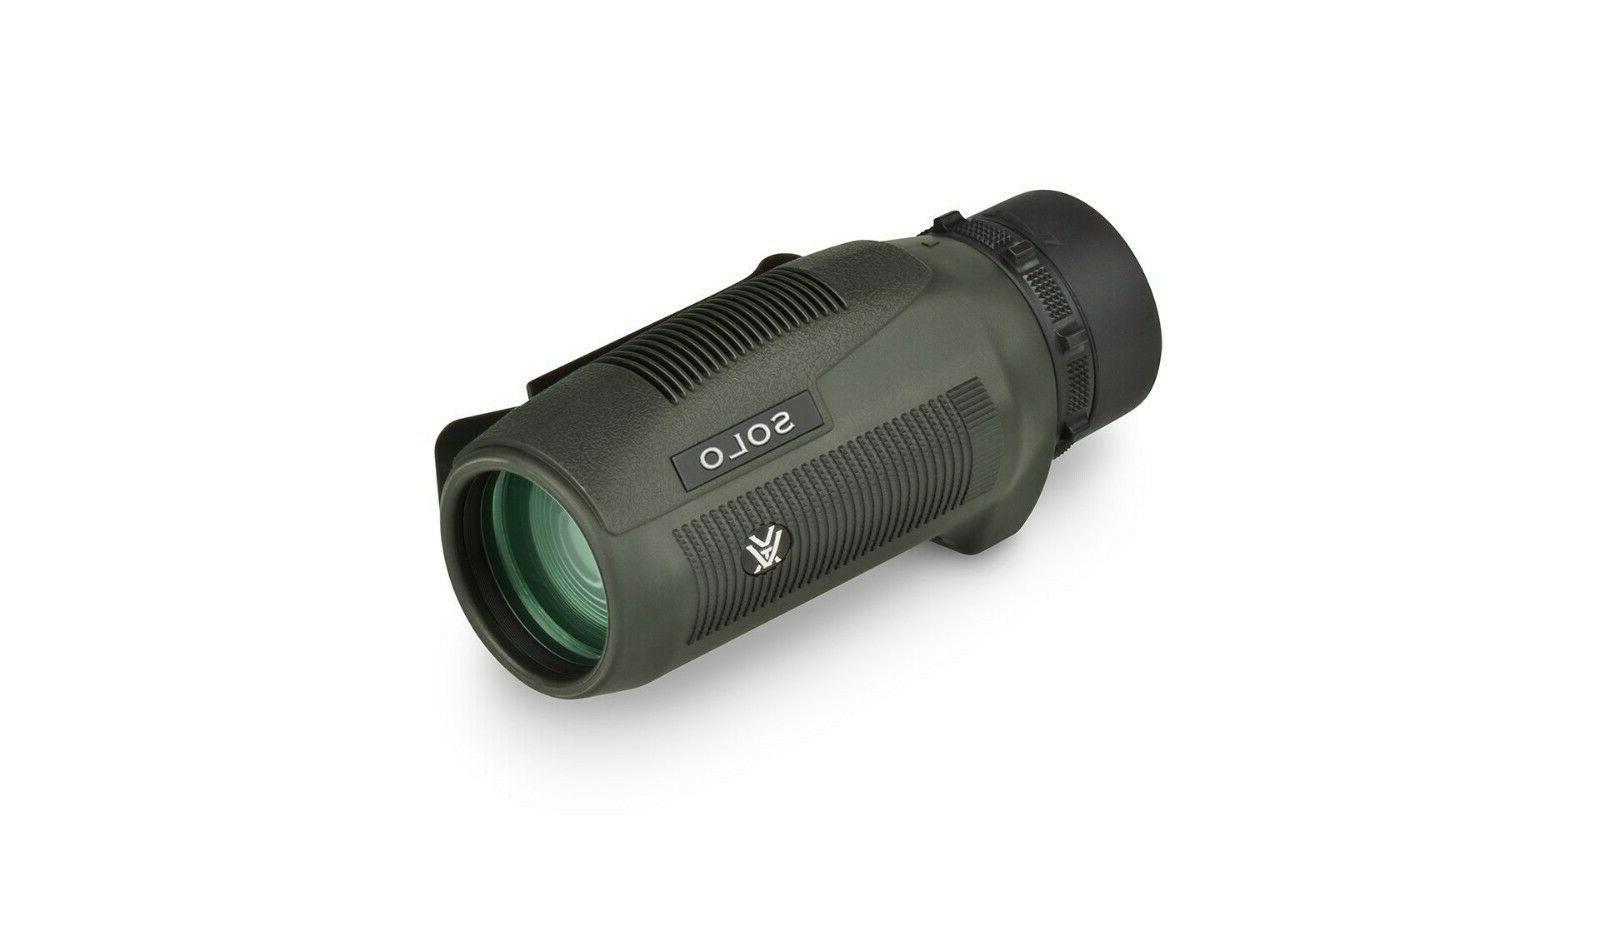 Vortex Solo 8x25 Monocular S825 + Vortex Lens Cleaning Pen